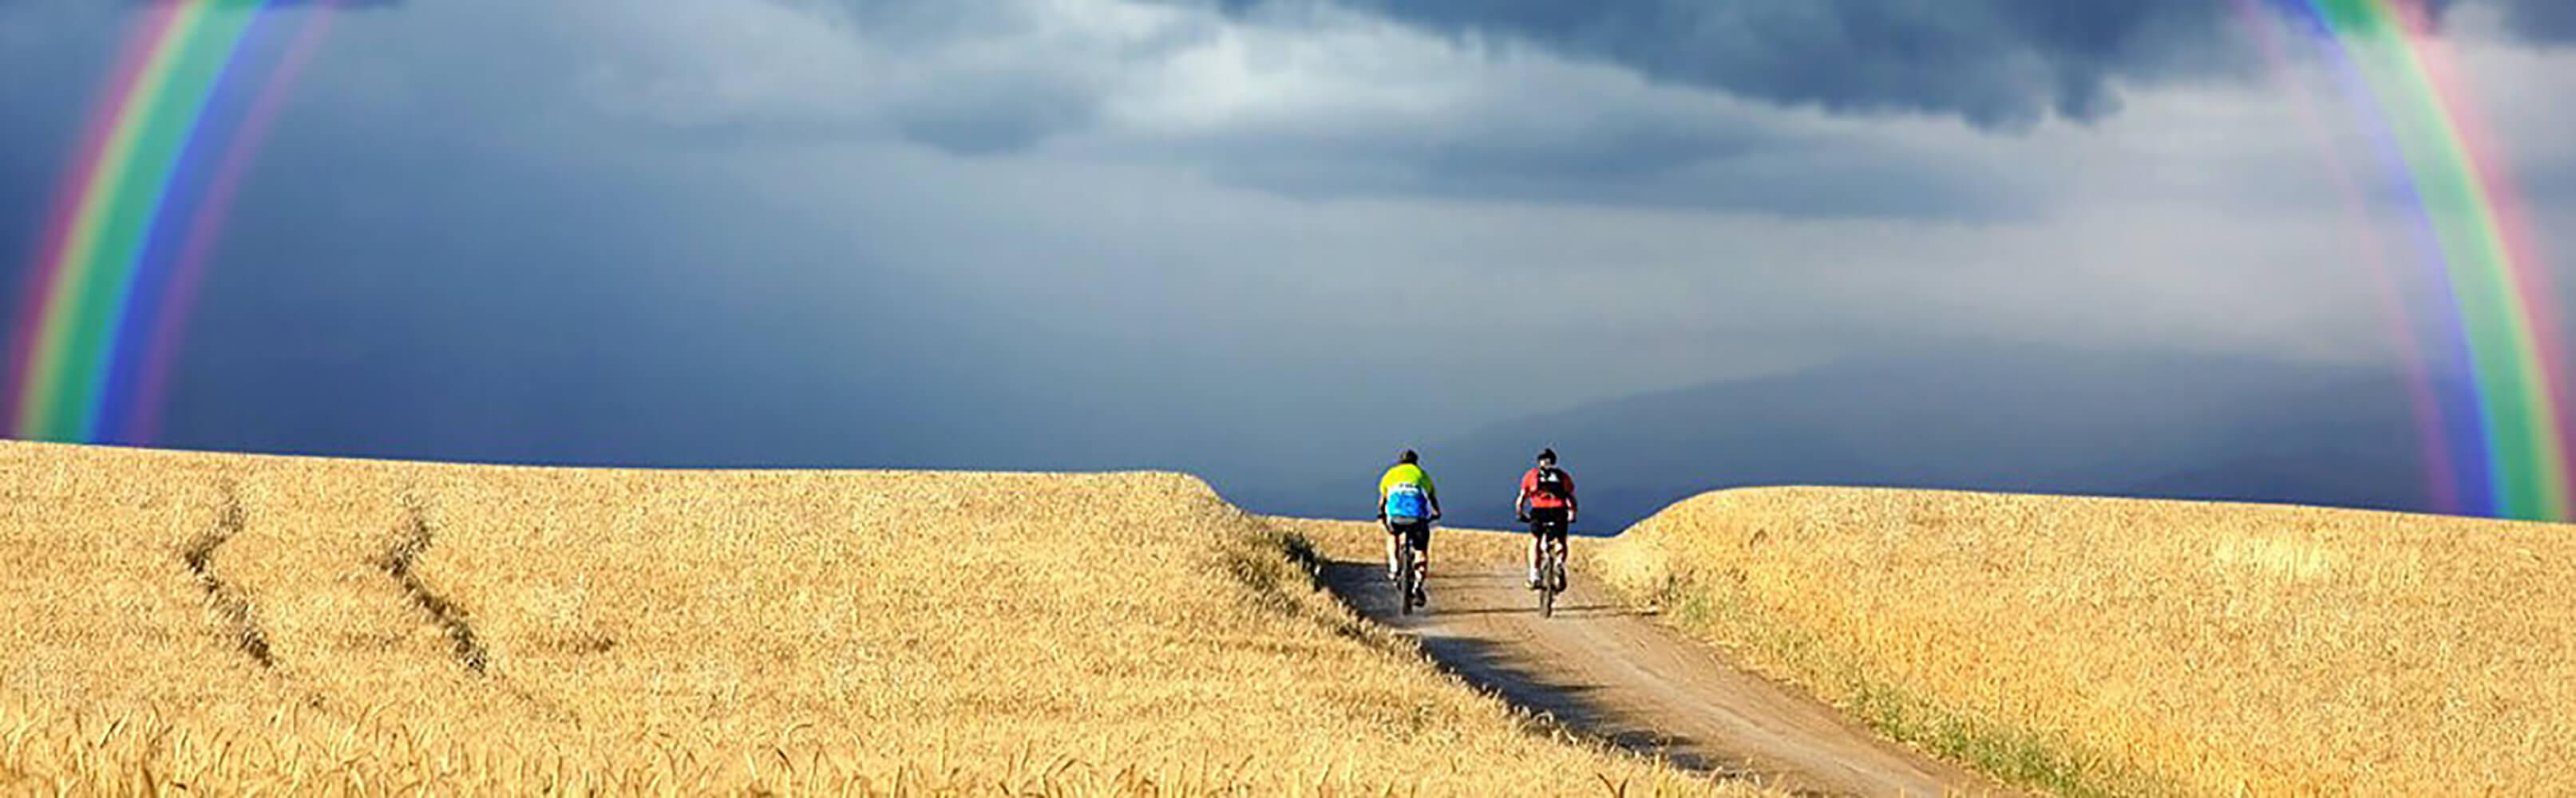 Jakobsweg Fahrradtour mit Vuelta Rad- und Wandertouren 1